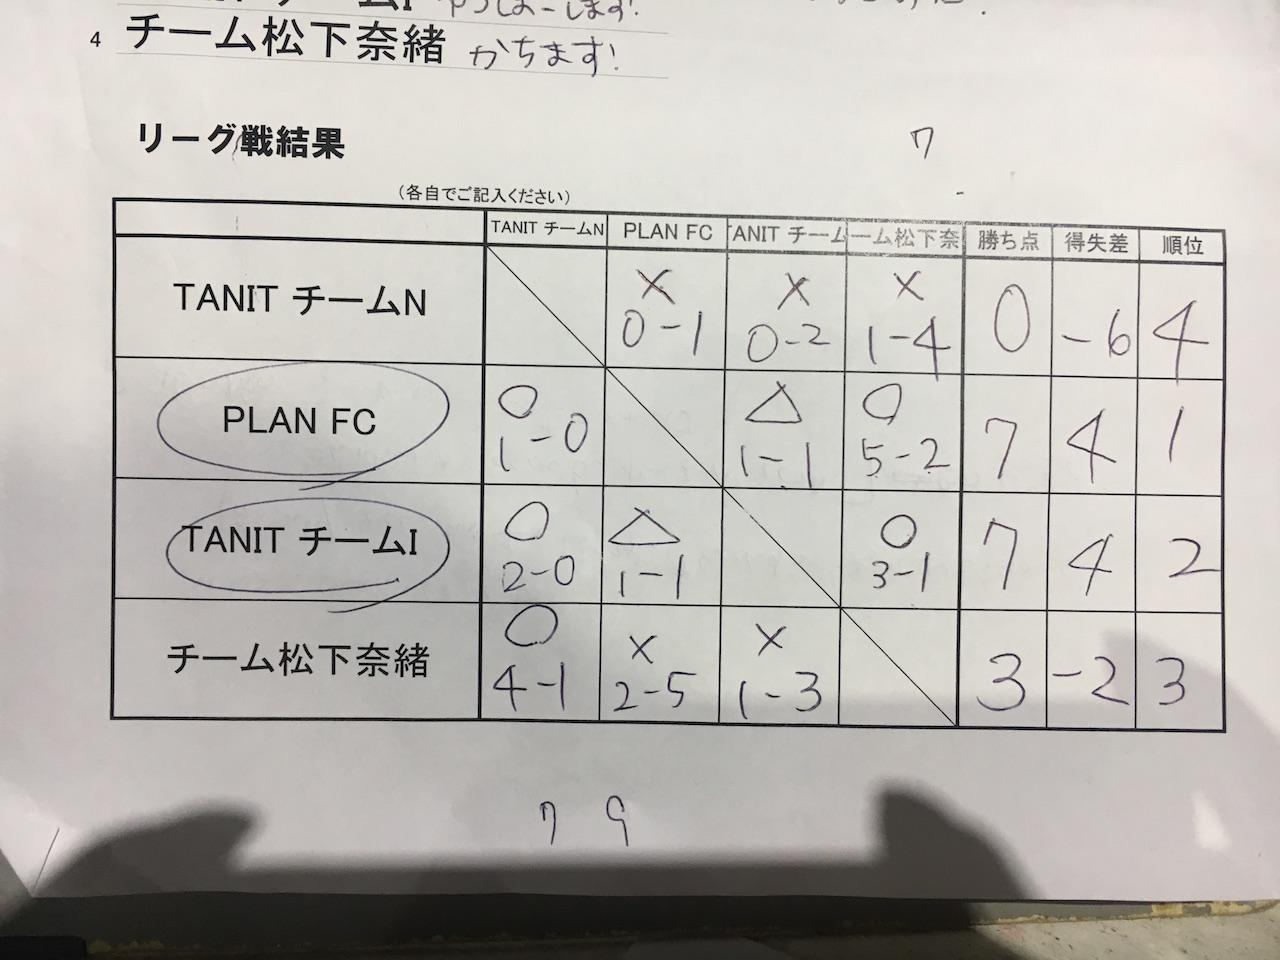 PLAN FC 新宿三丁目